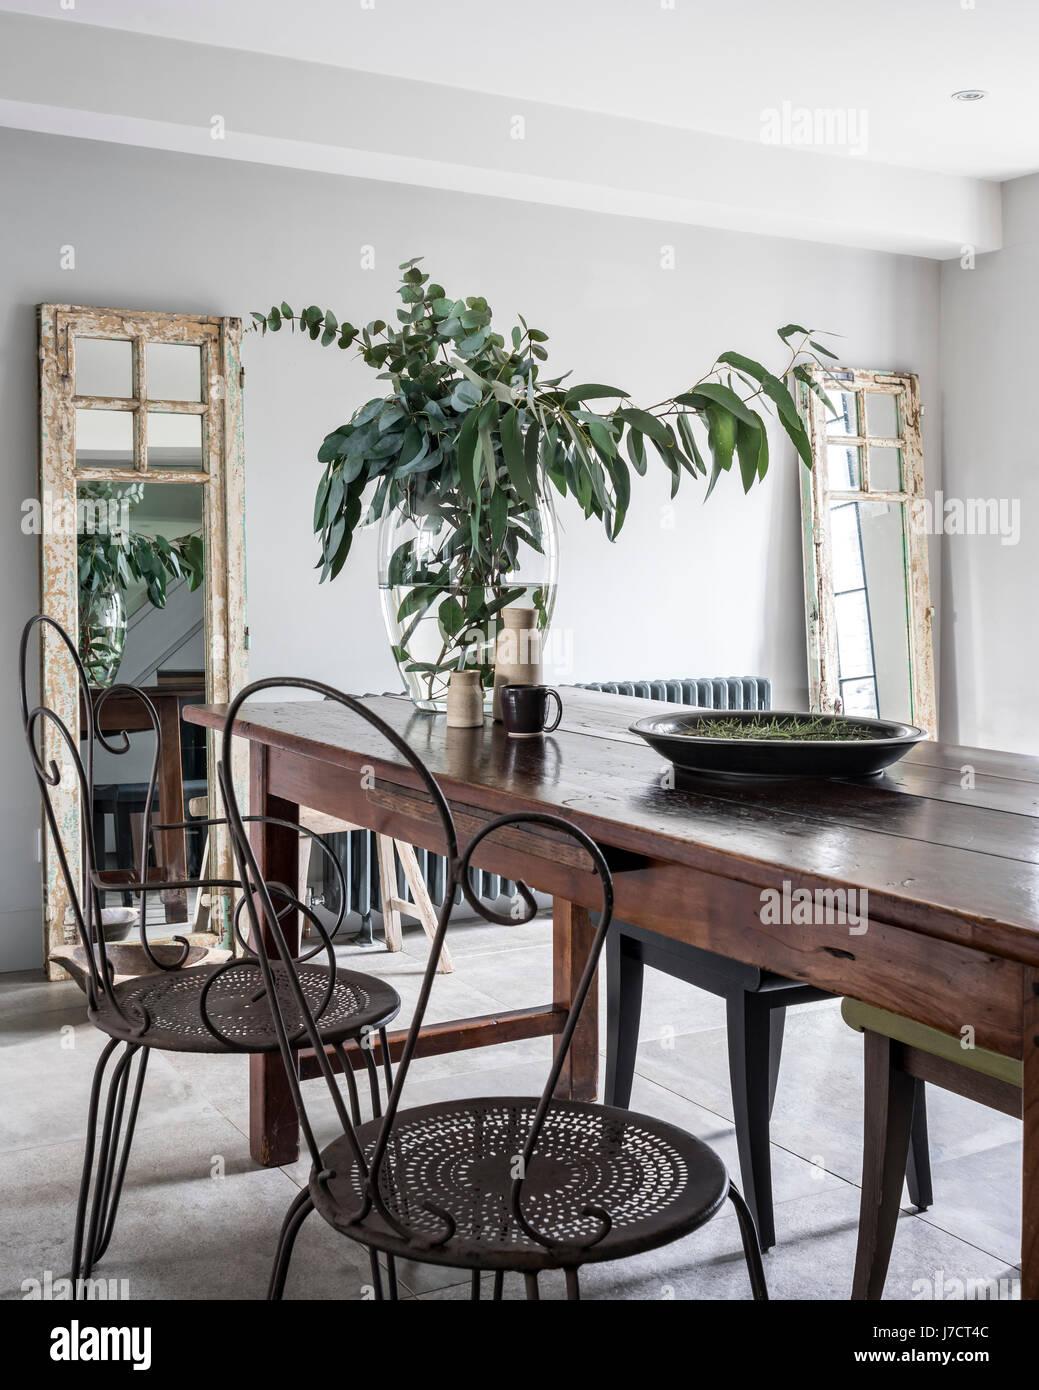 Vintage Kitchen Table Chairs Stockfotos & Vintage Kitchen Table ...